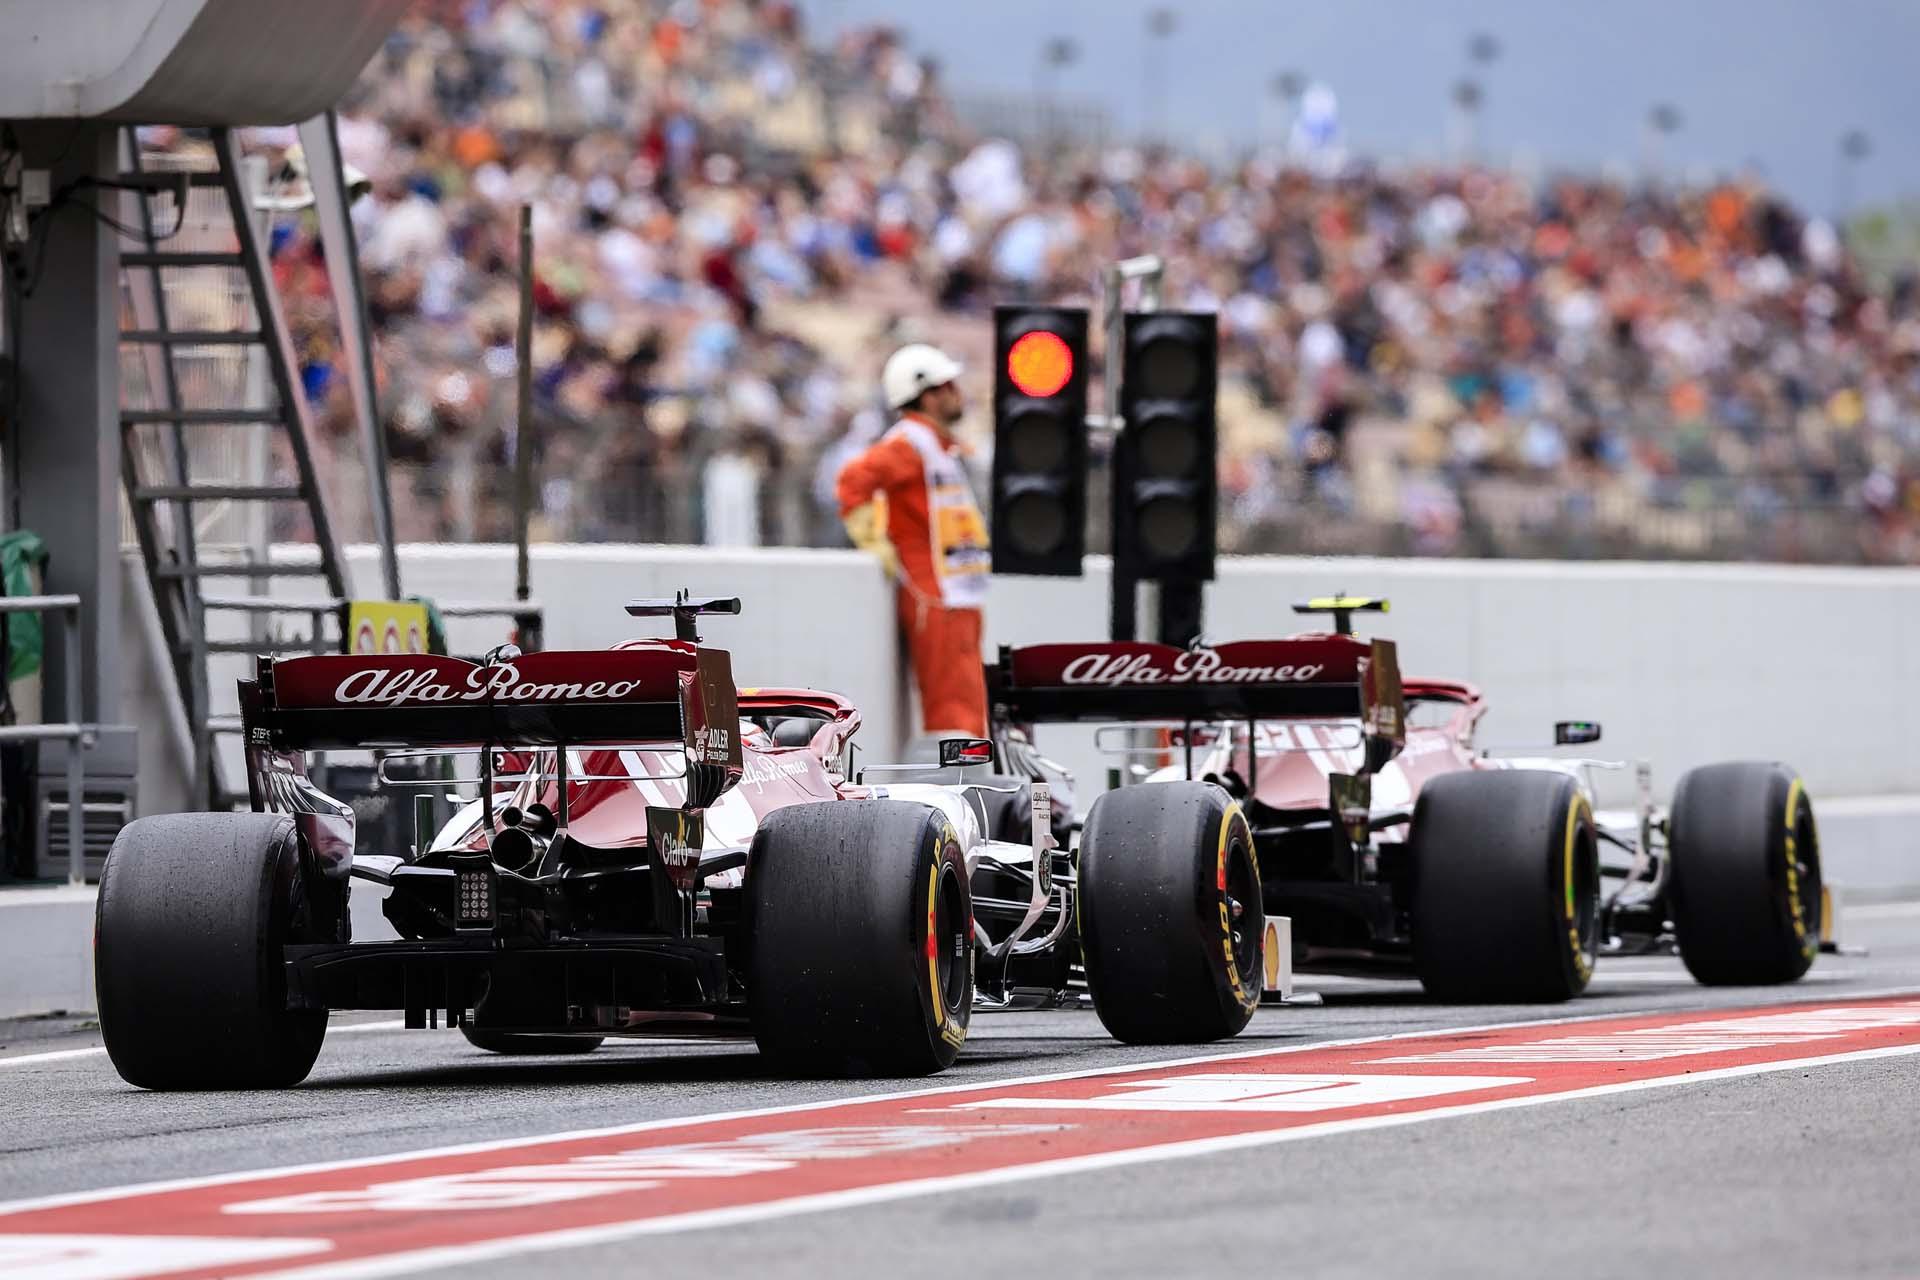 F1 - SPAIN GRAND PRIX 2019